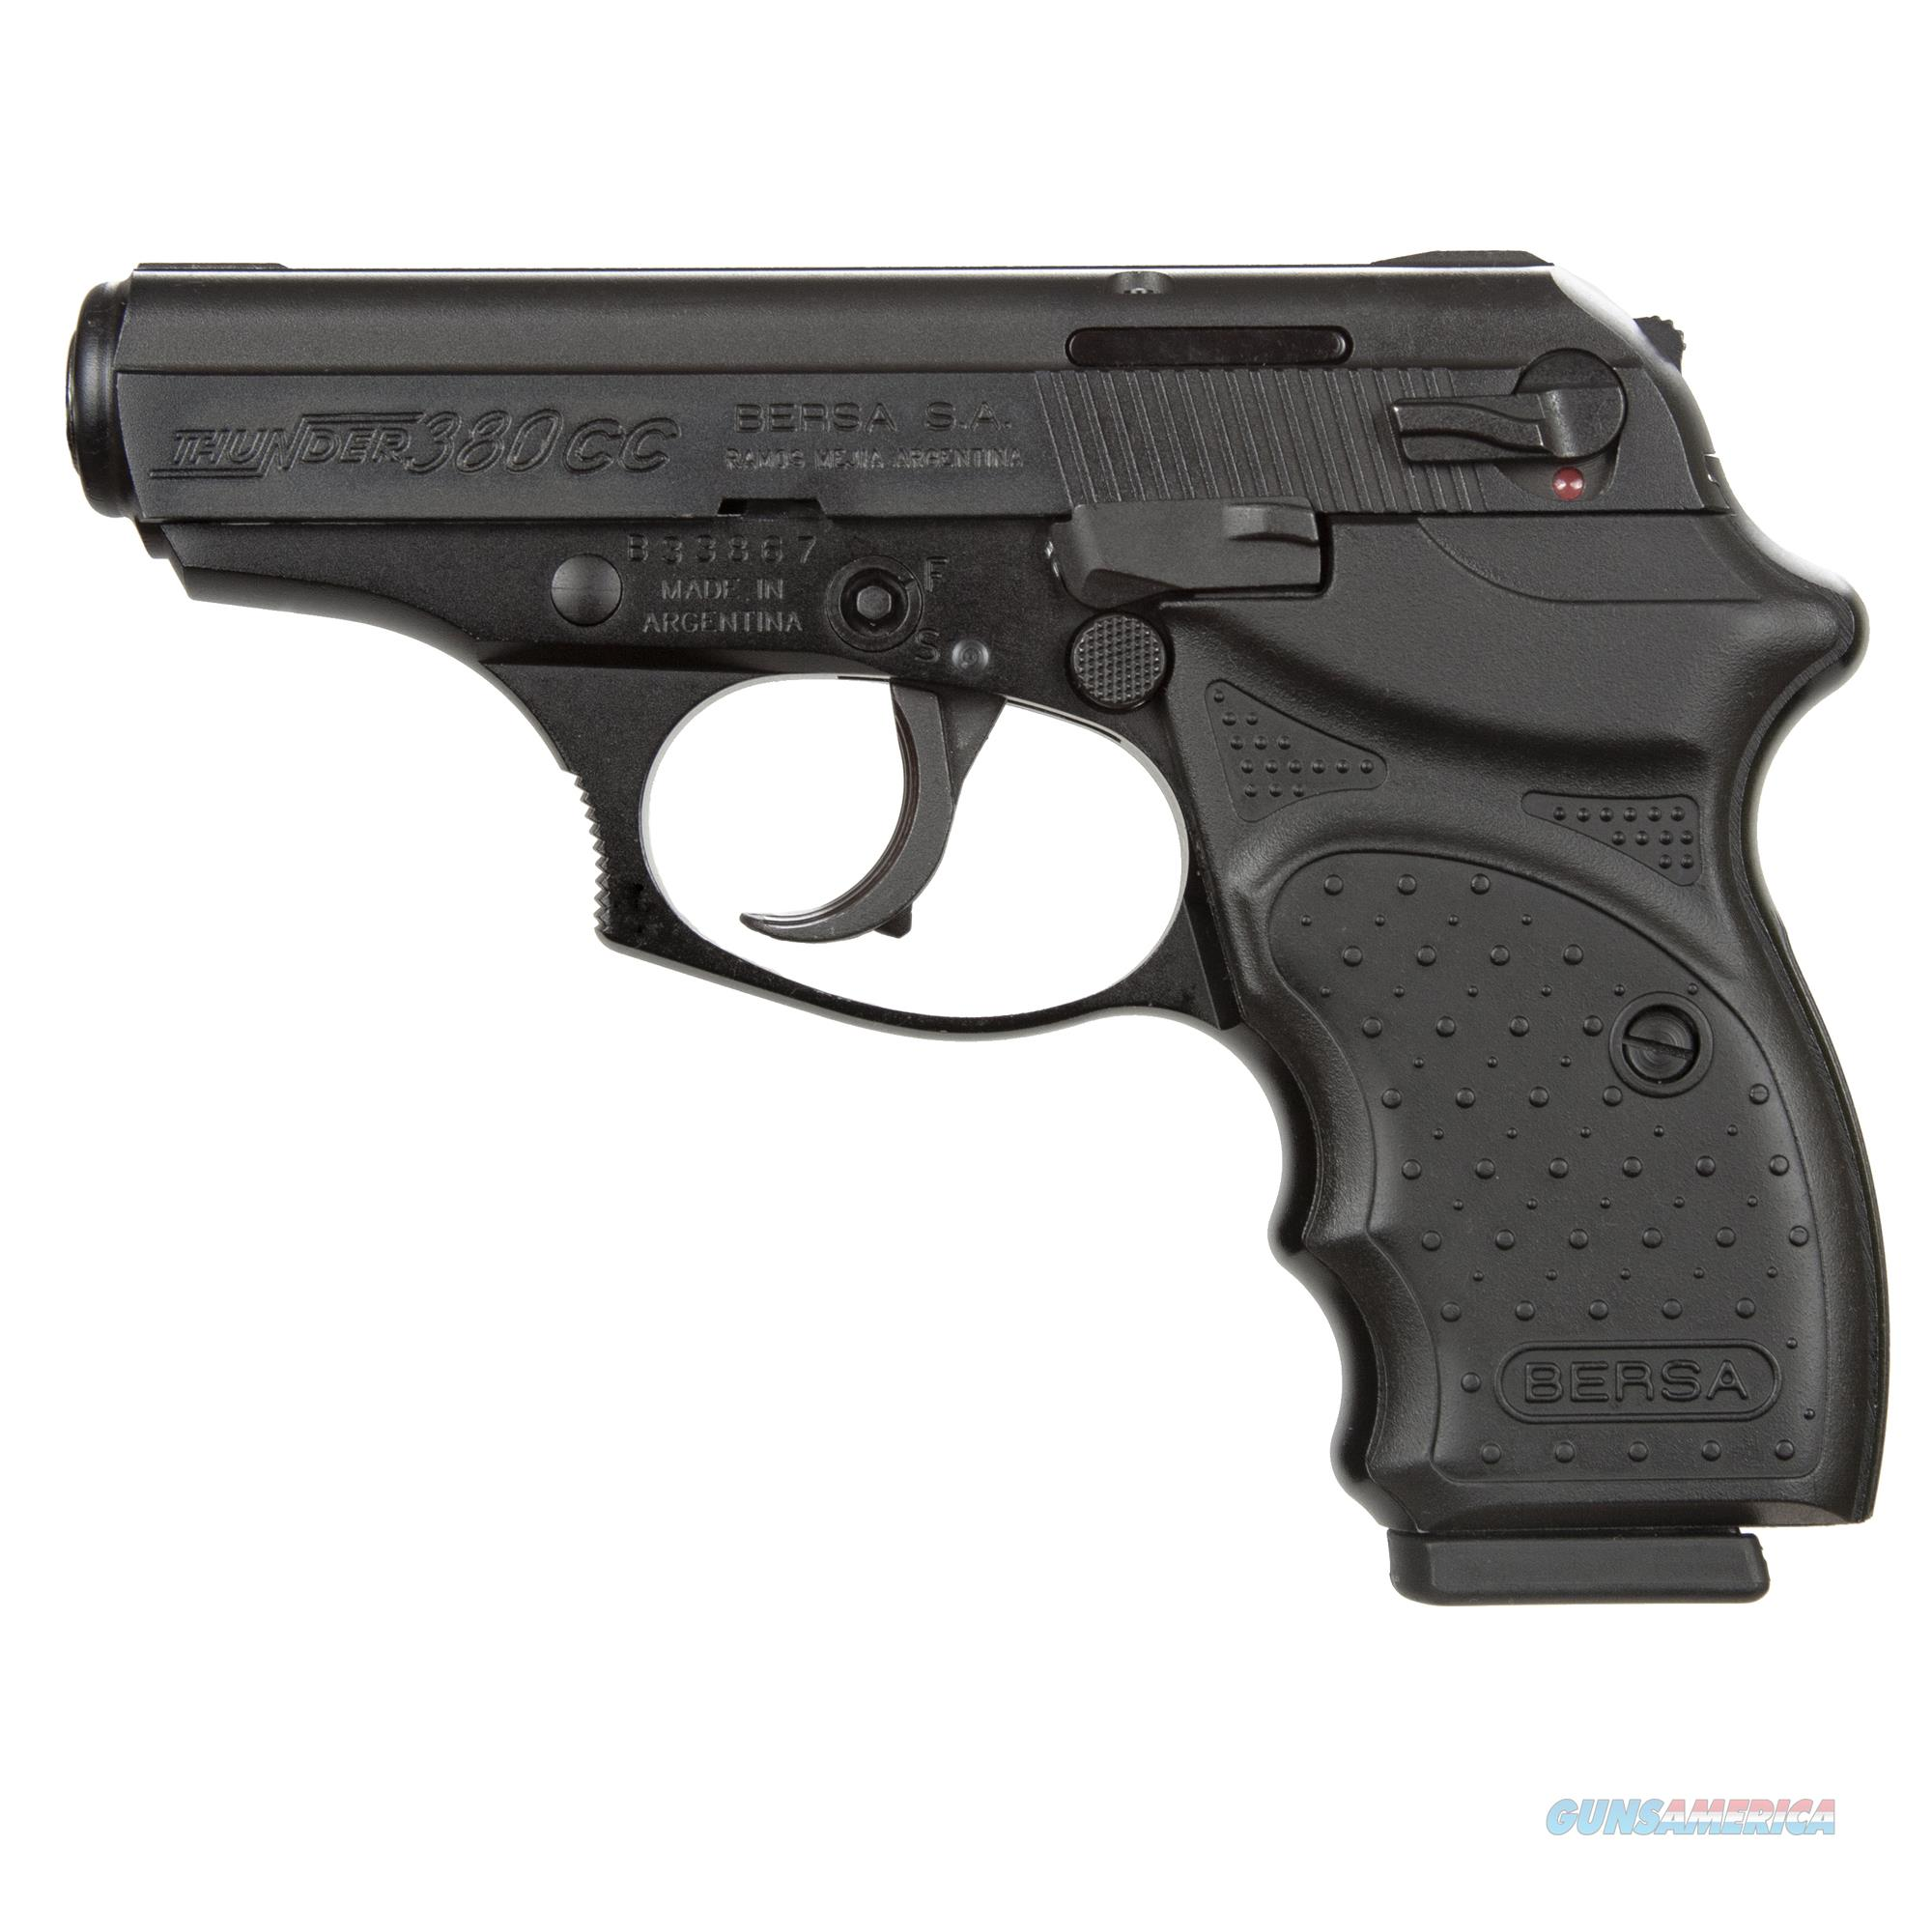 "Bersa Thunder .380 ACP 3.2"" 8+1 - New in Box  Guns > Pistols > Bersa Pistols"